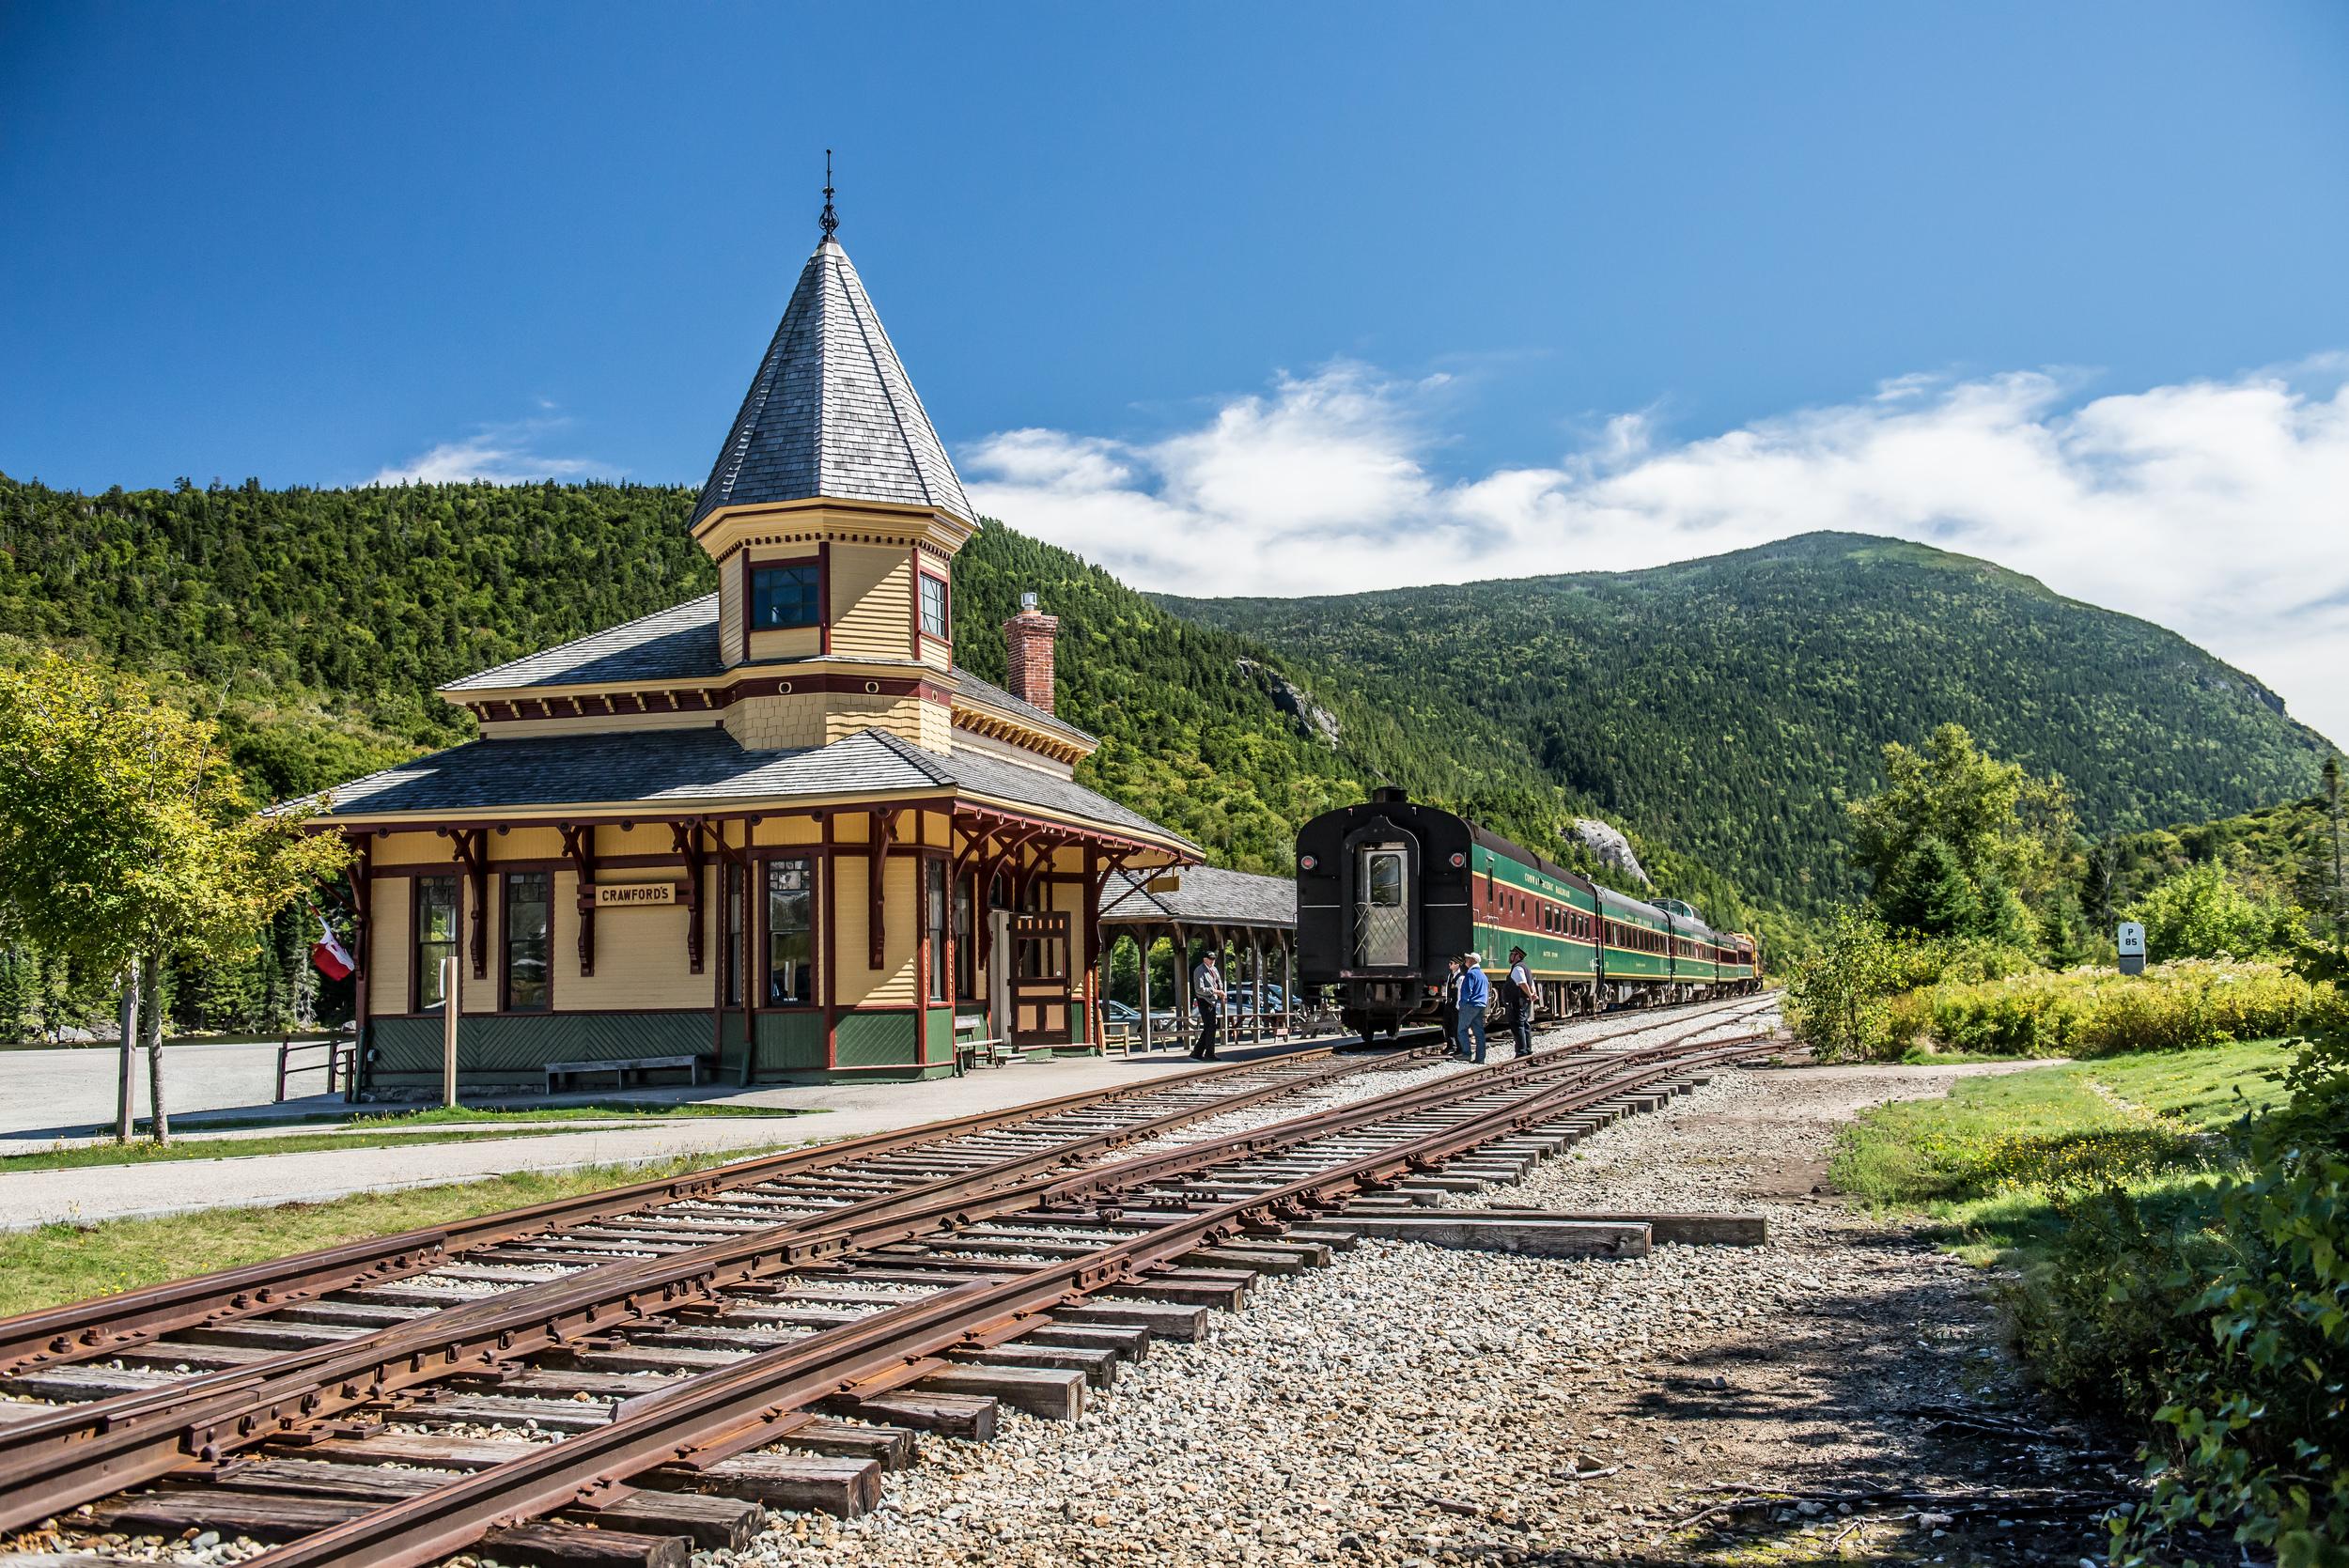 Crawford Station